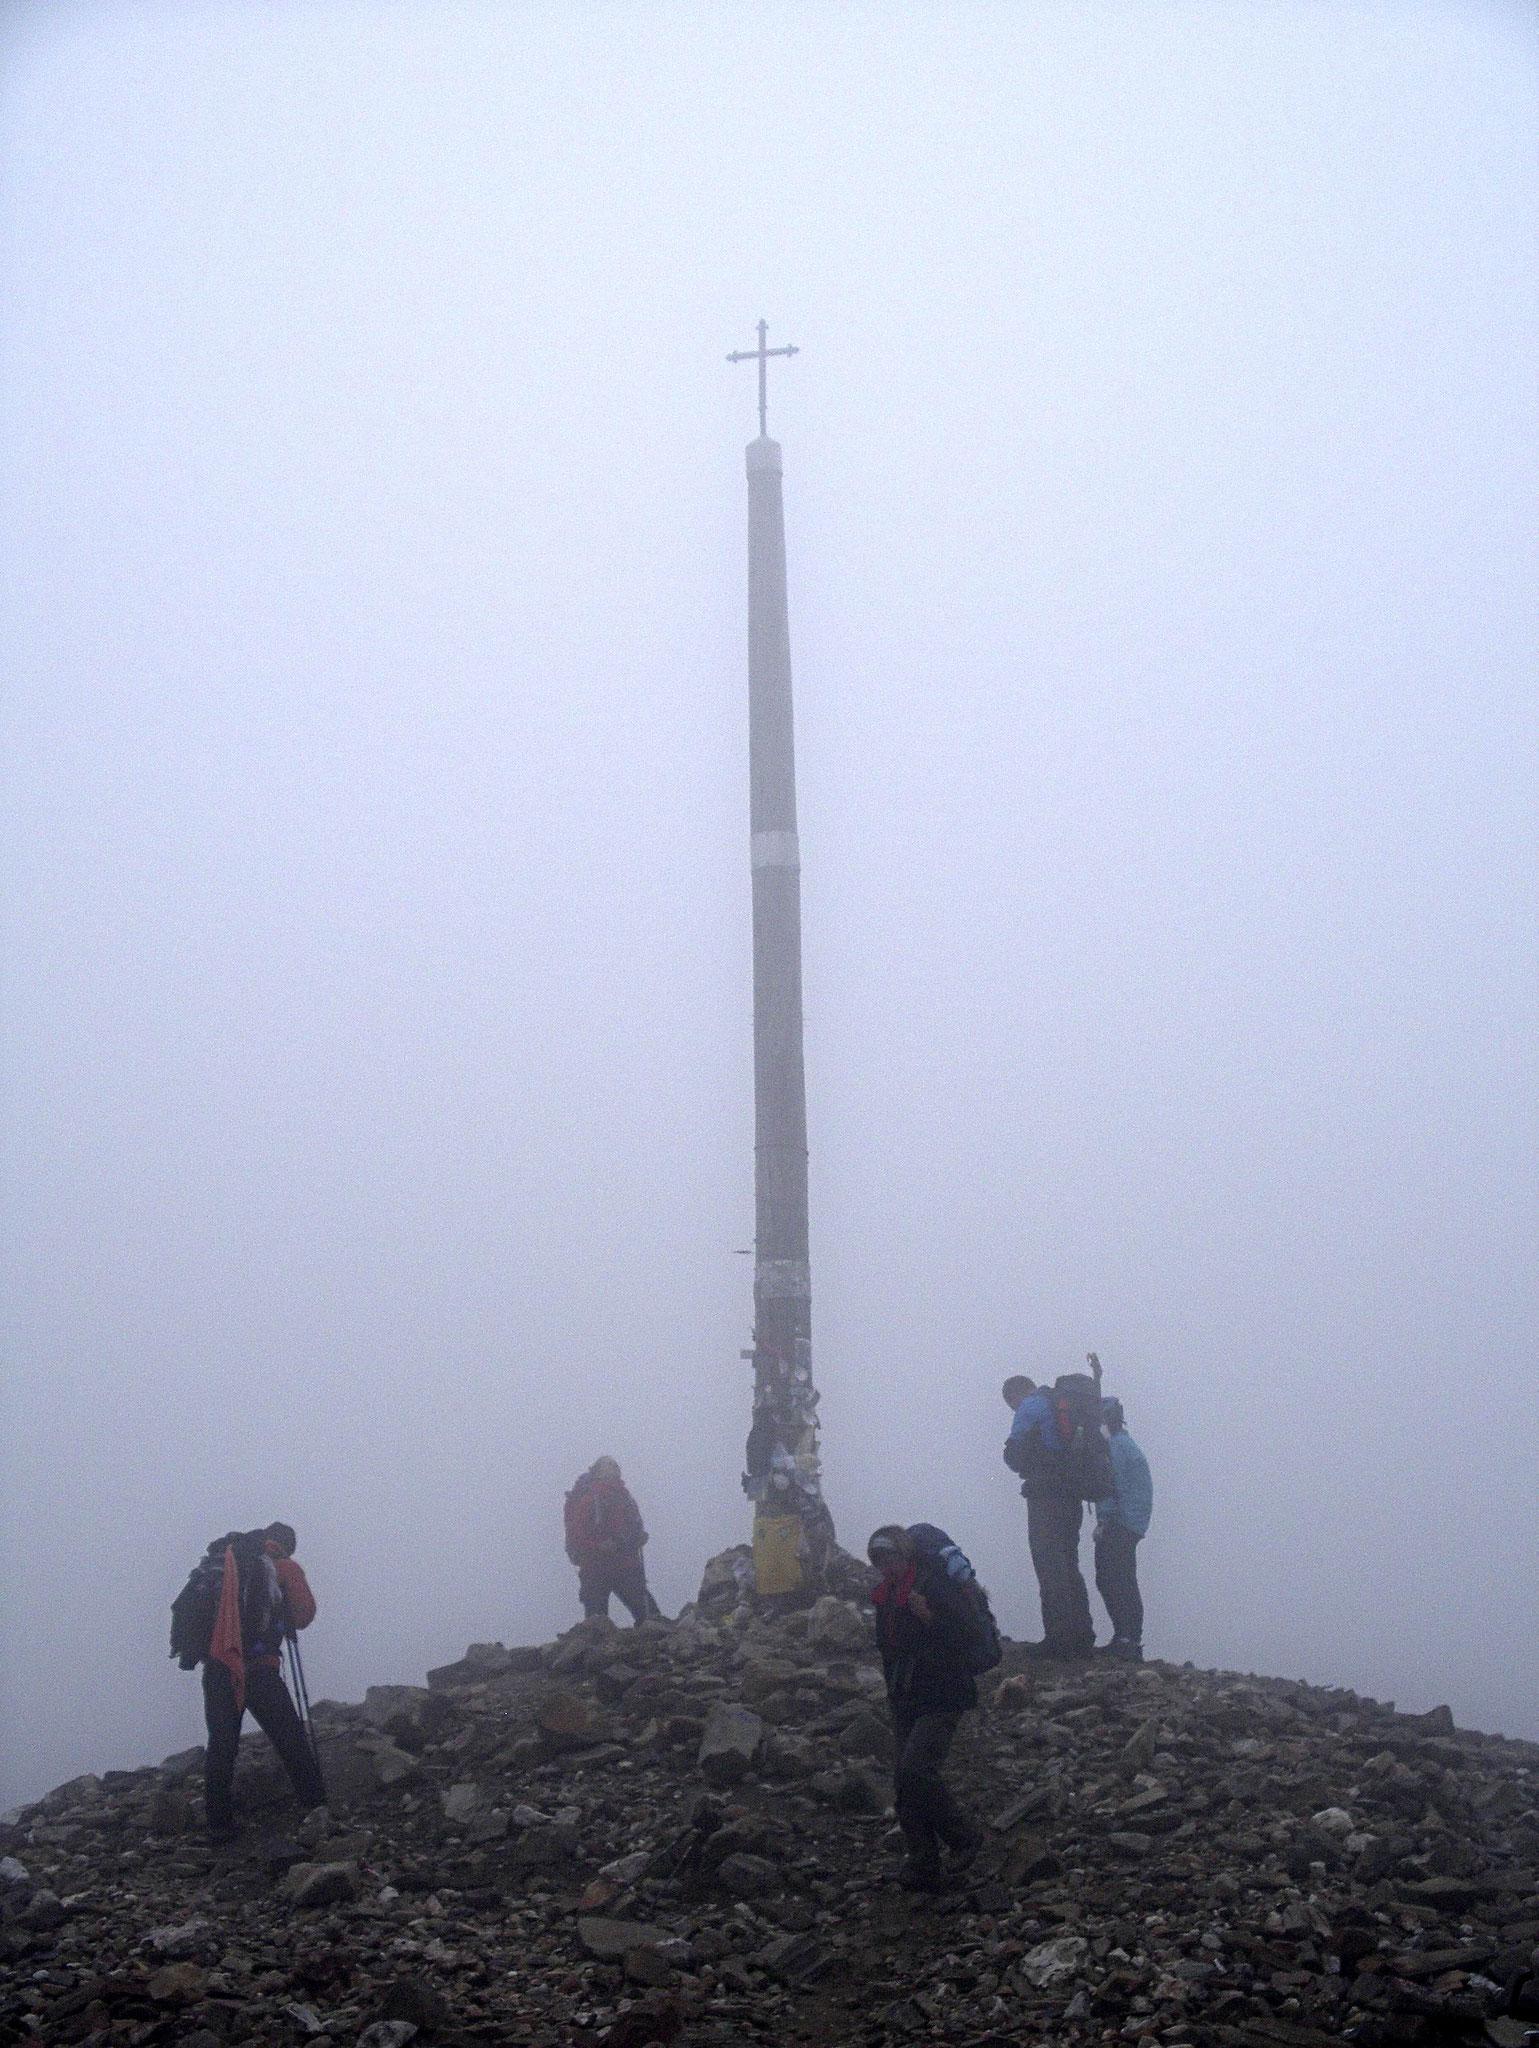 Cruz de Ferro am Monte Irago